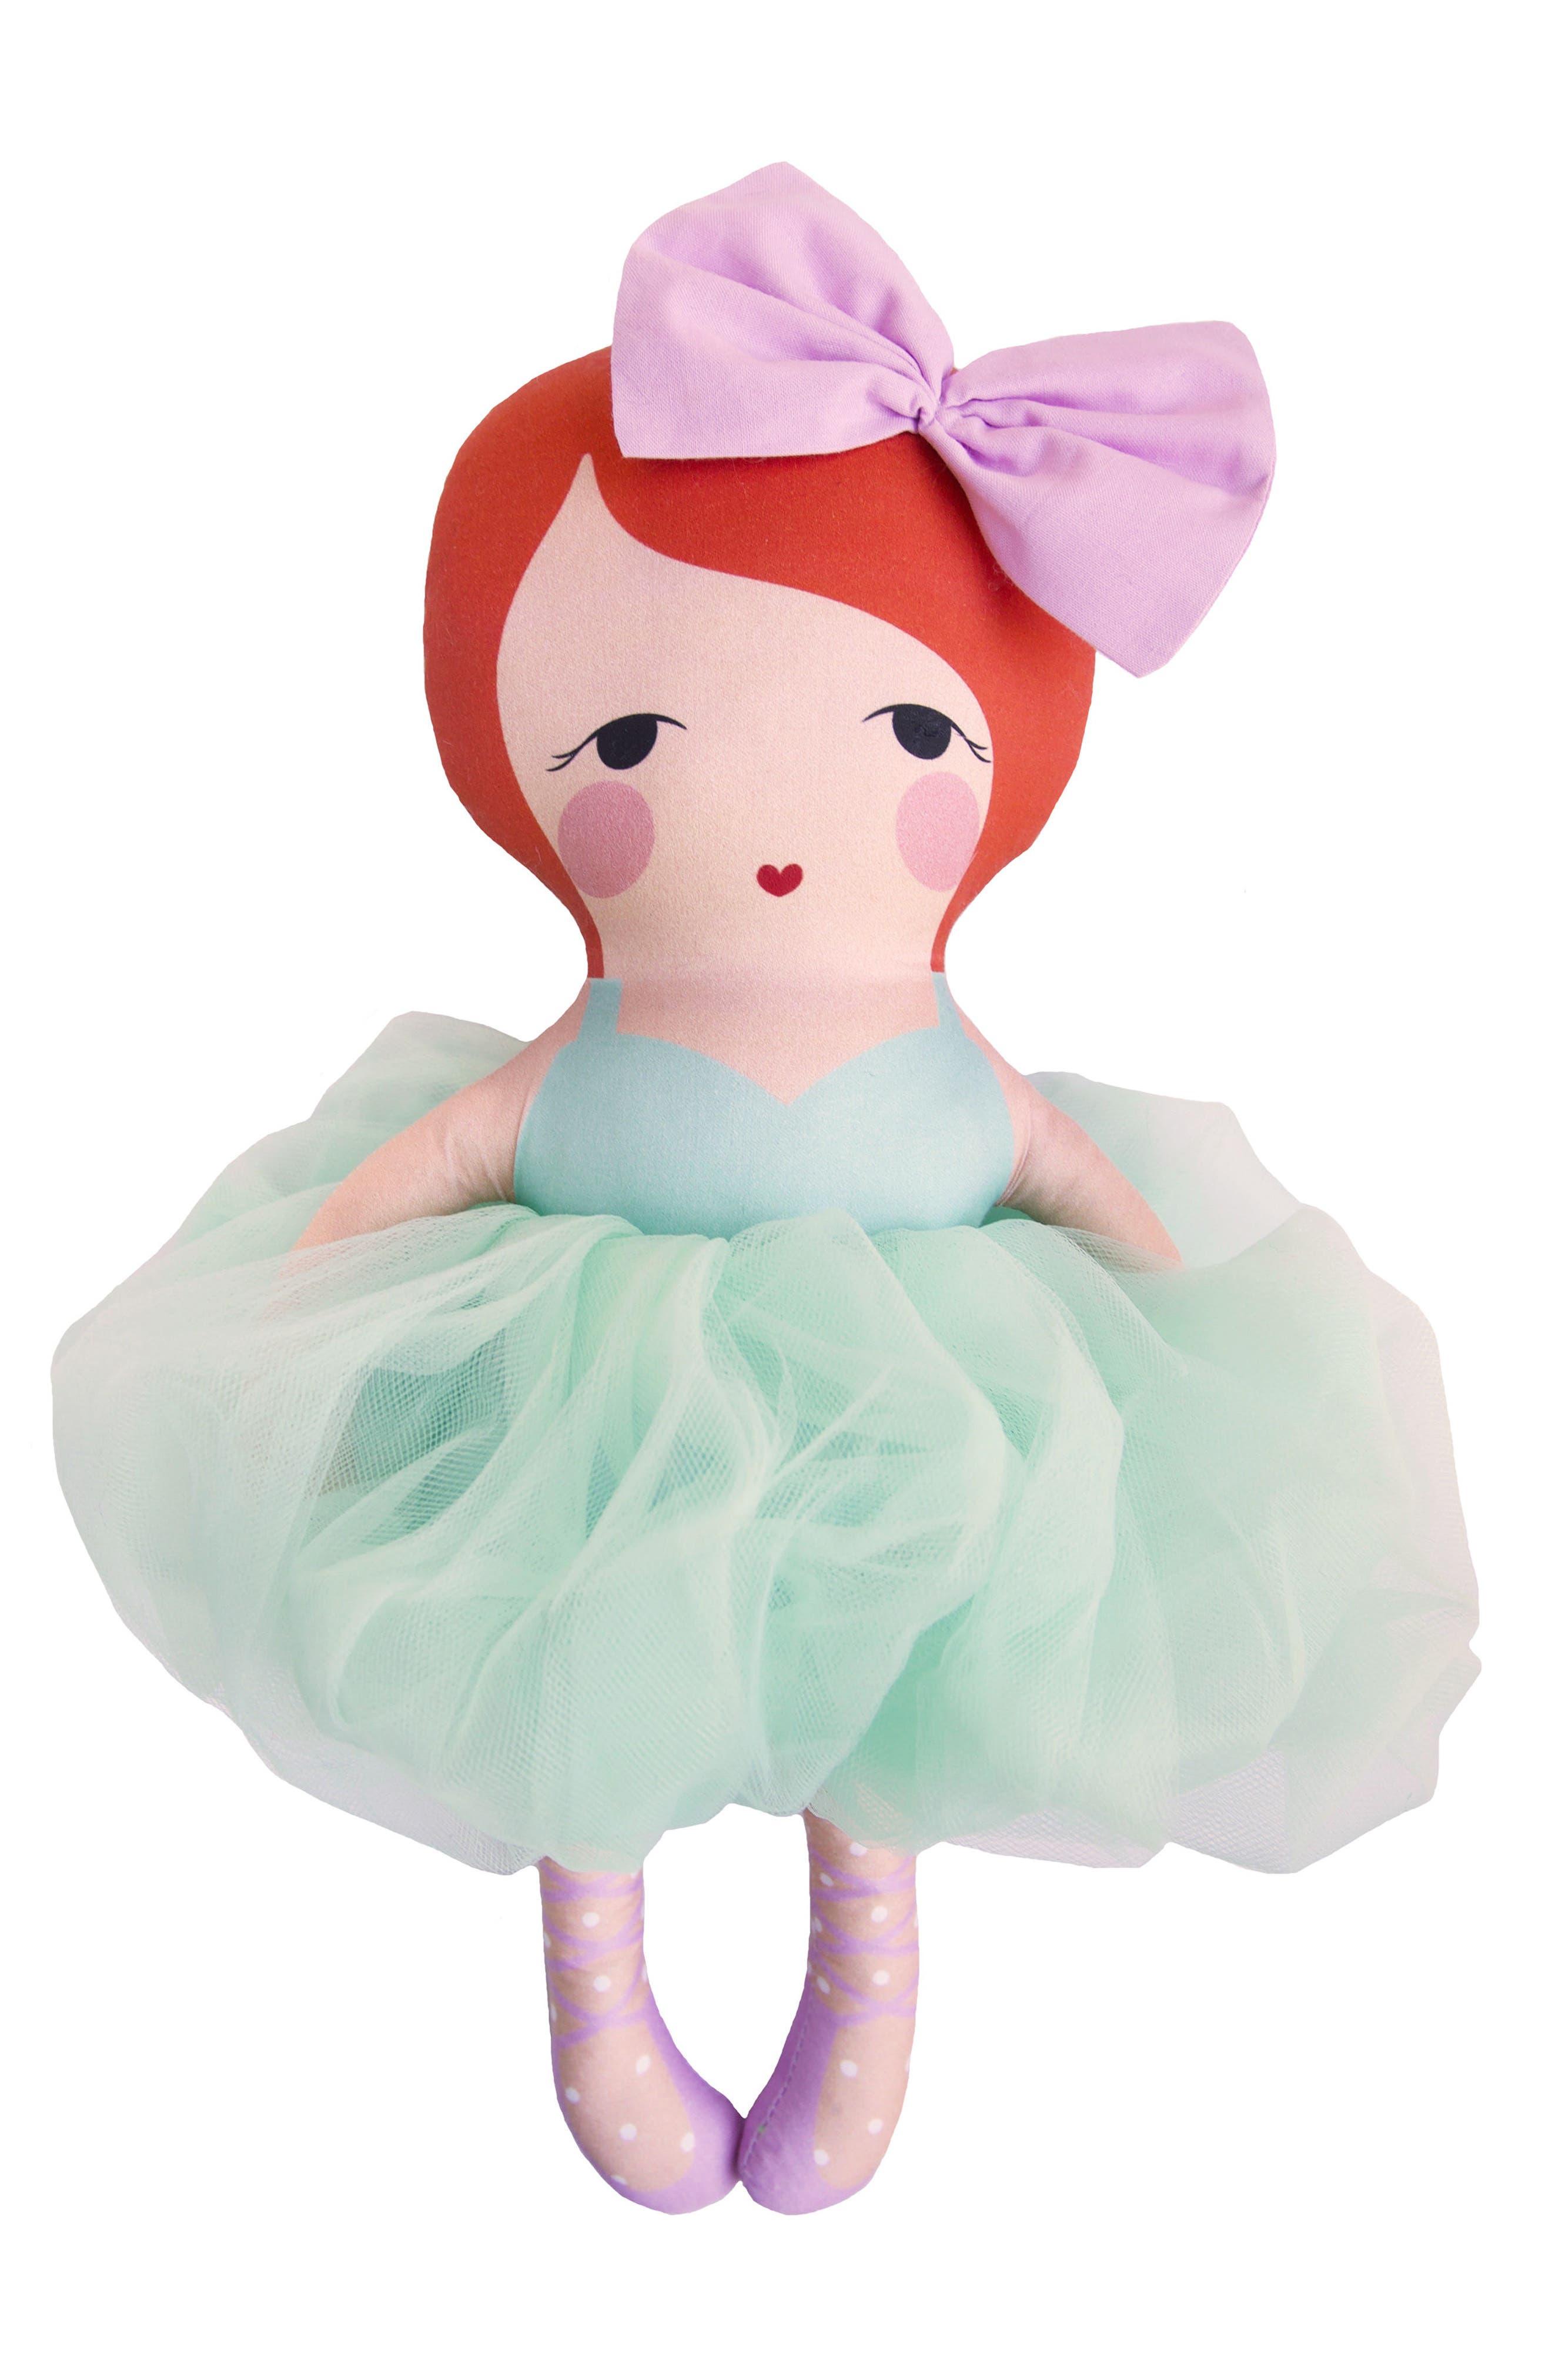 Candy Kirby Designs Autumn Ballerina Doll